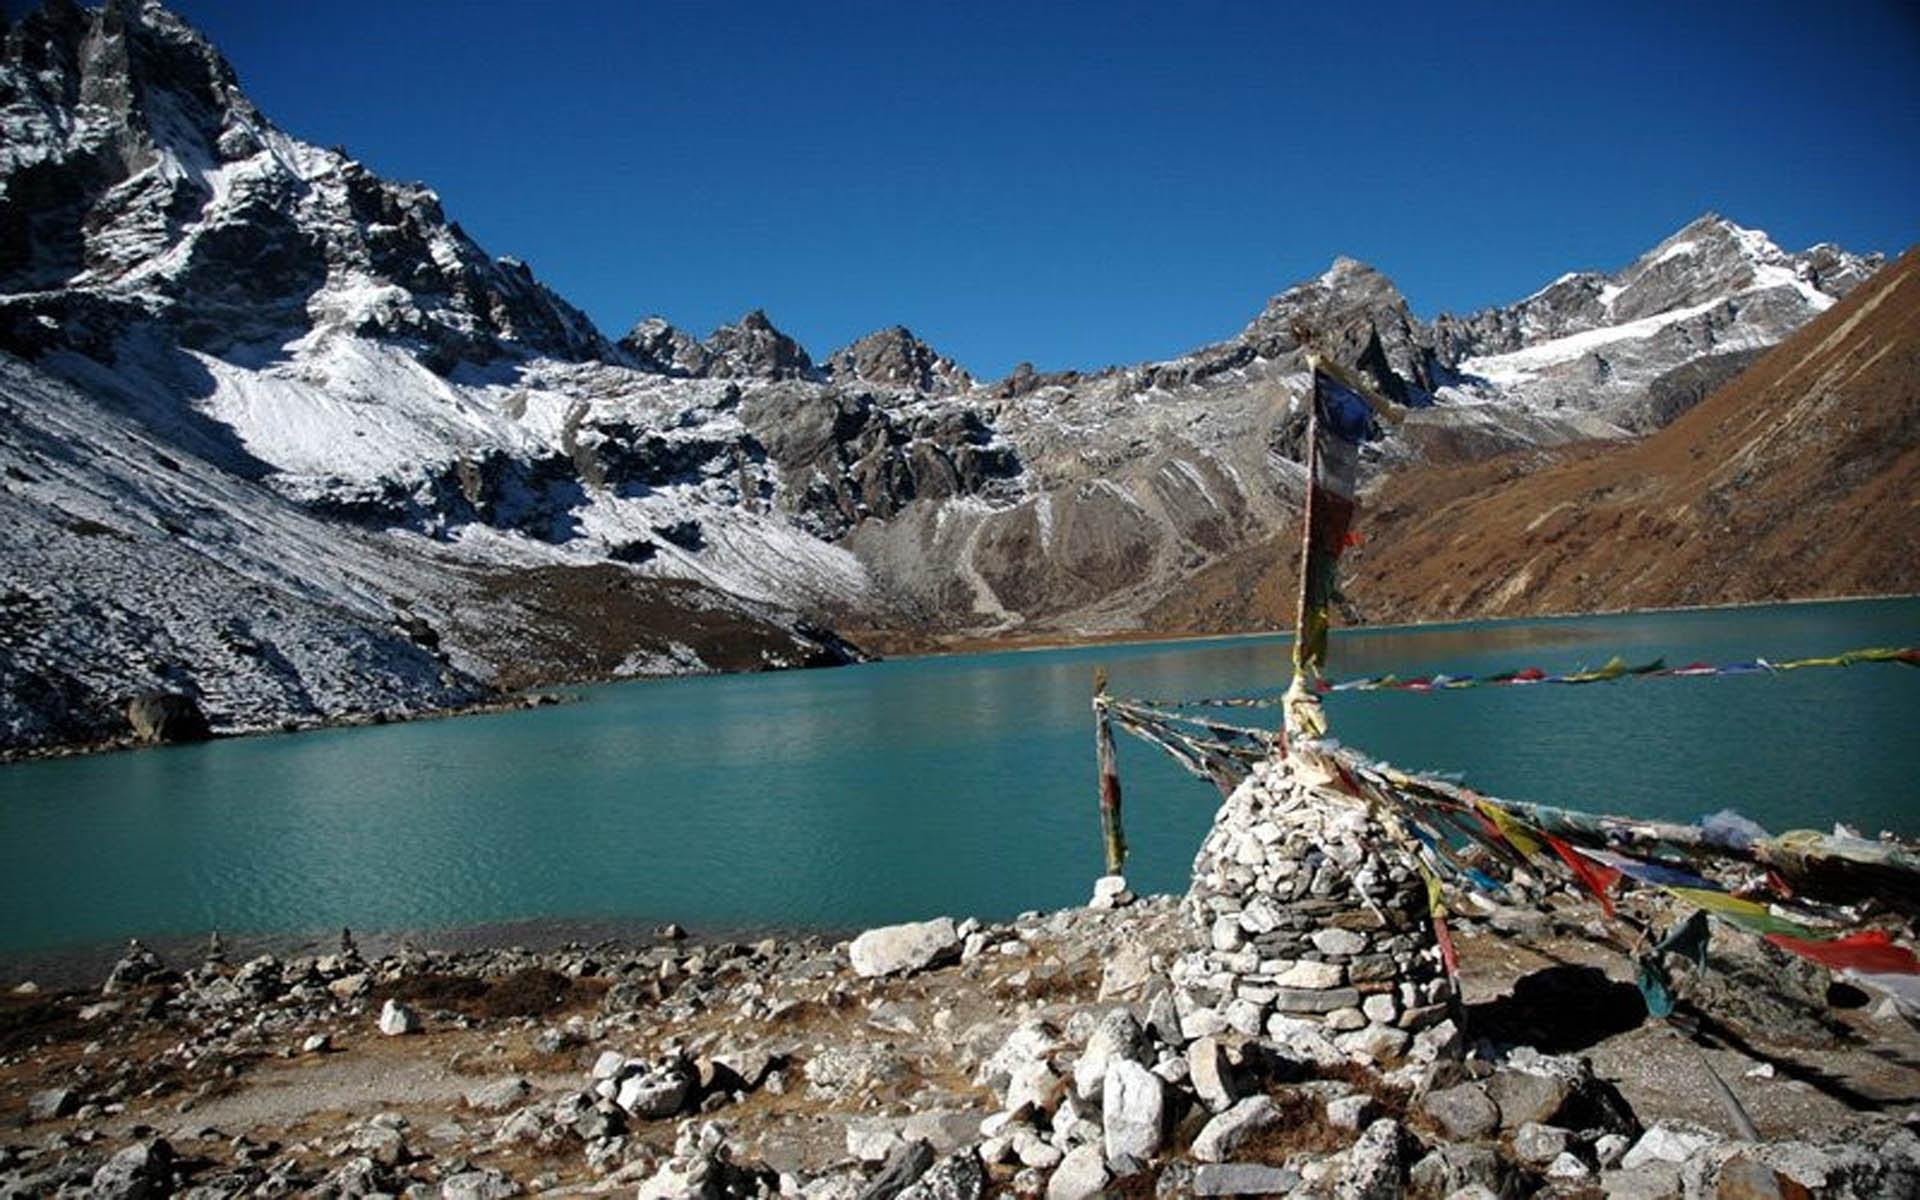 Trekking in Nepal (1920 x 1200)